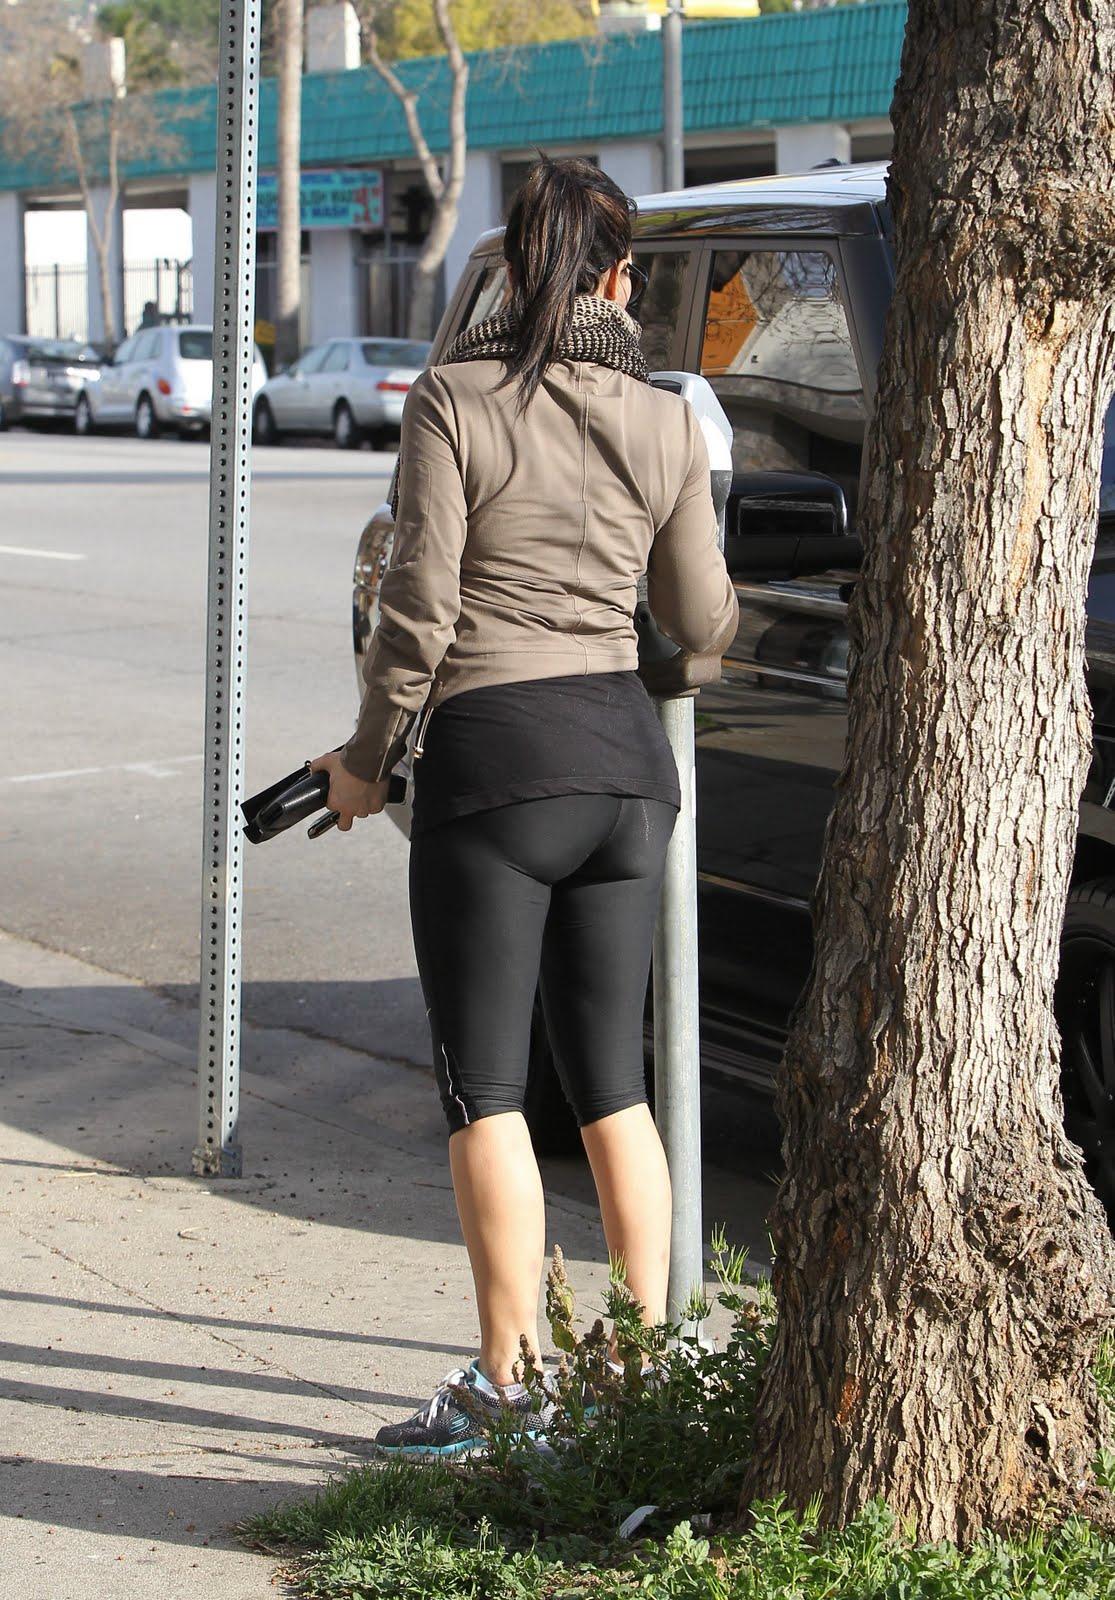 Read ass legging kim kardashian consider